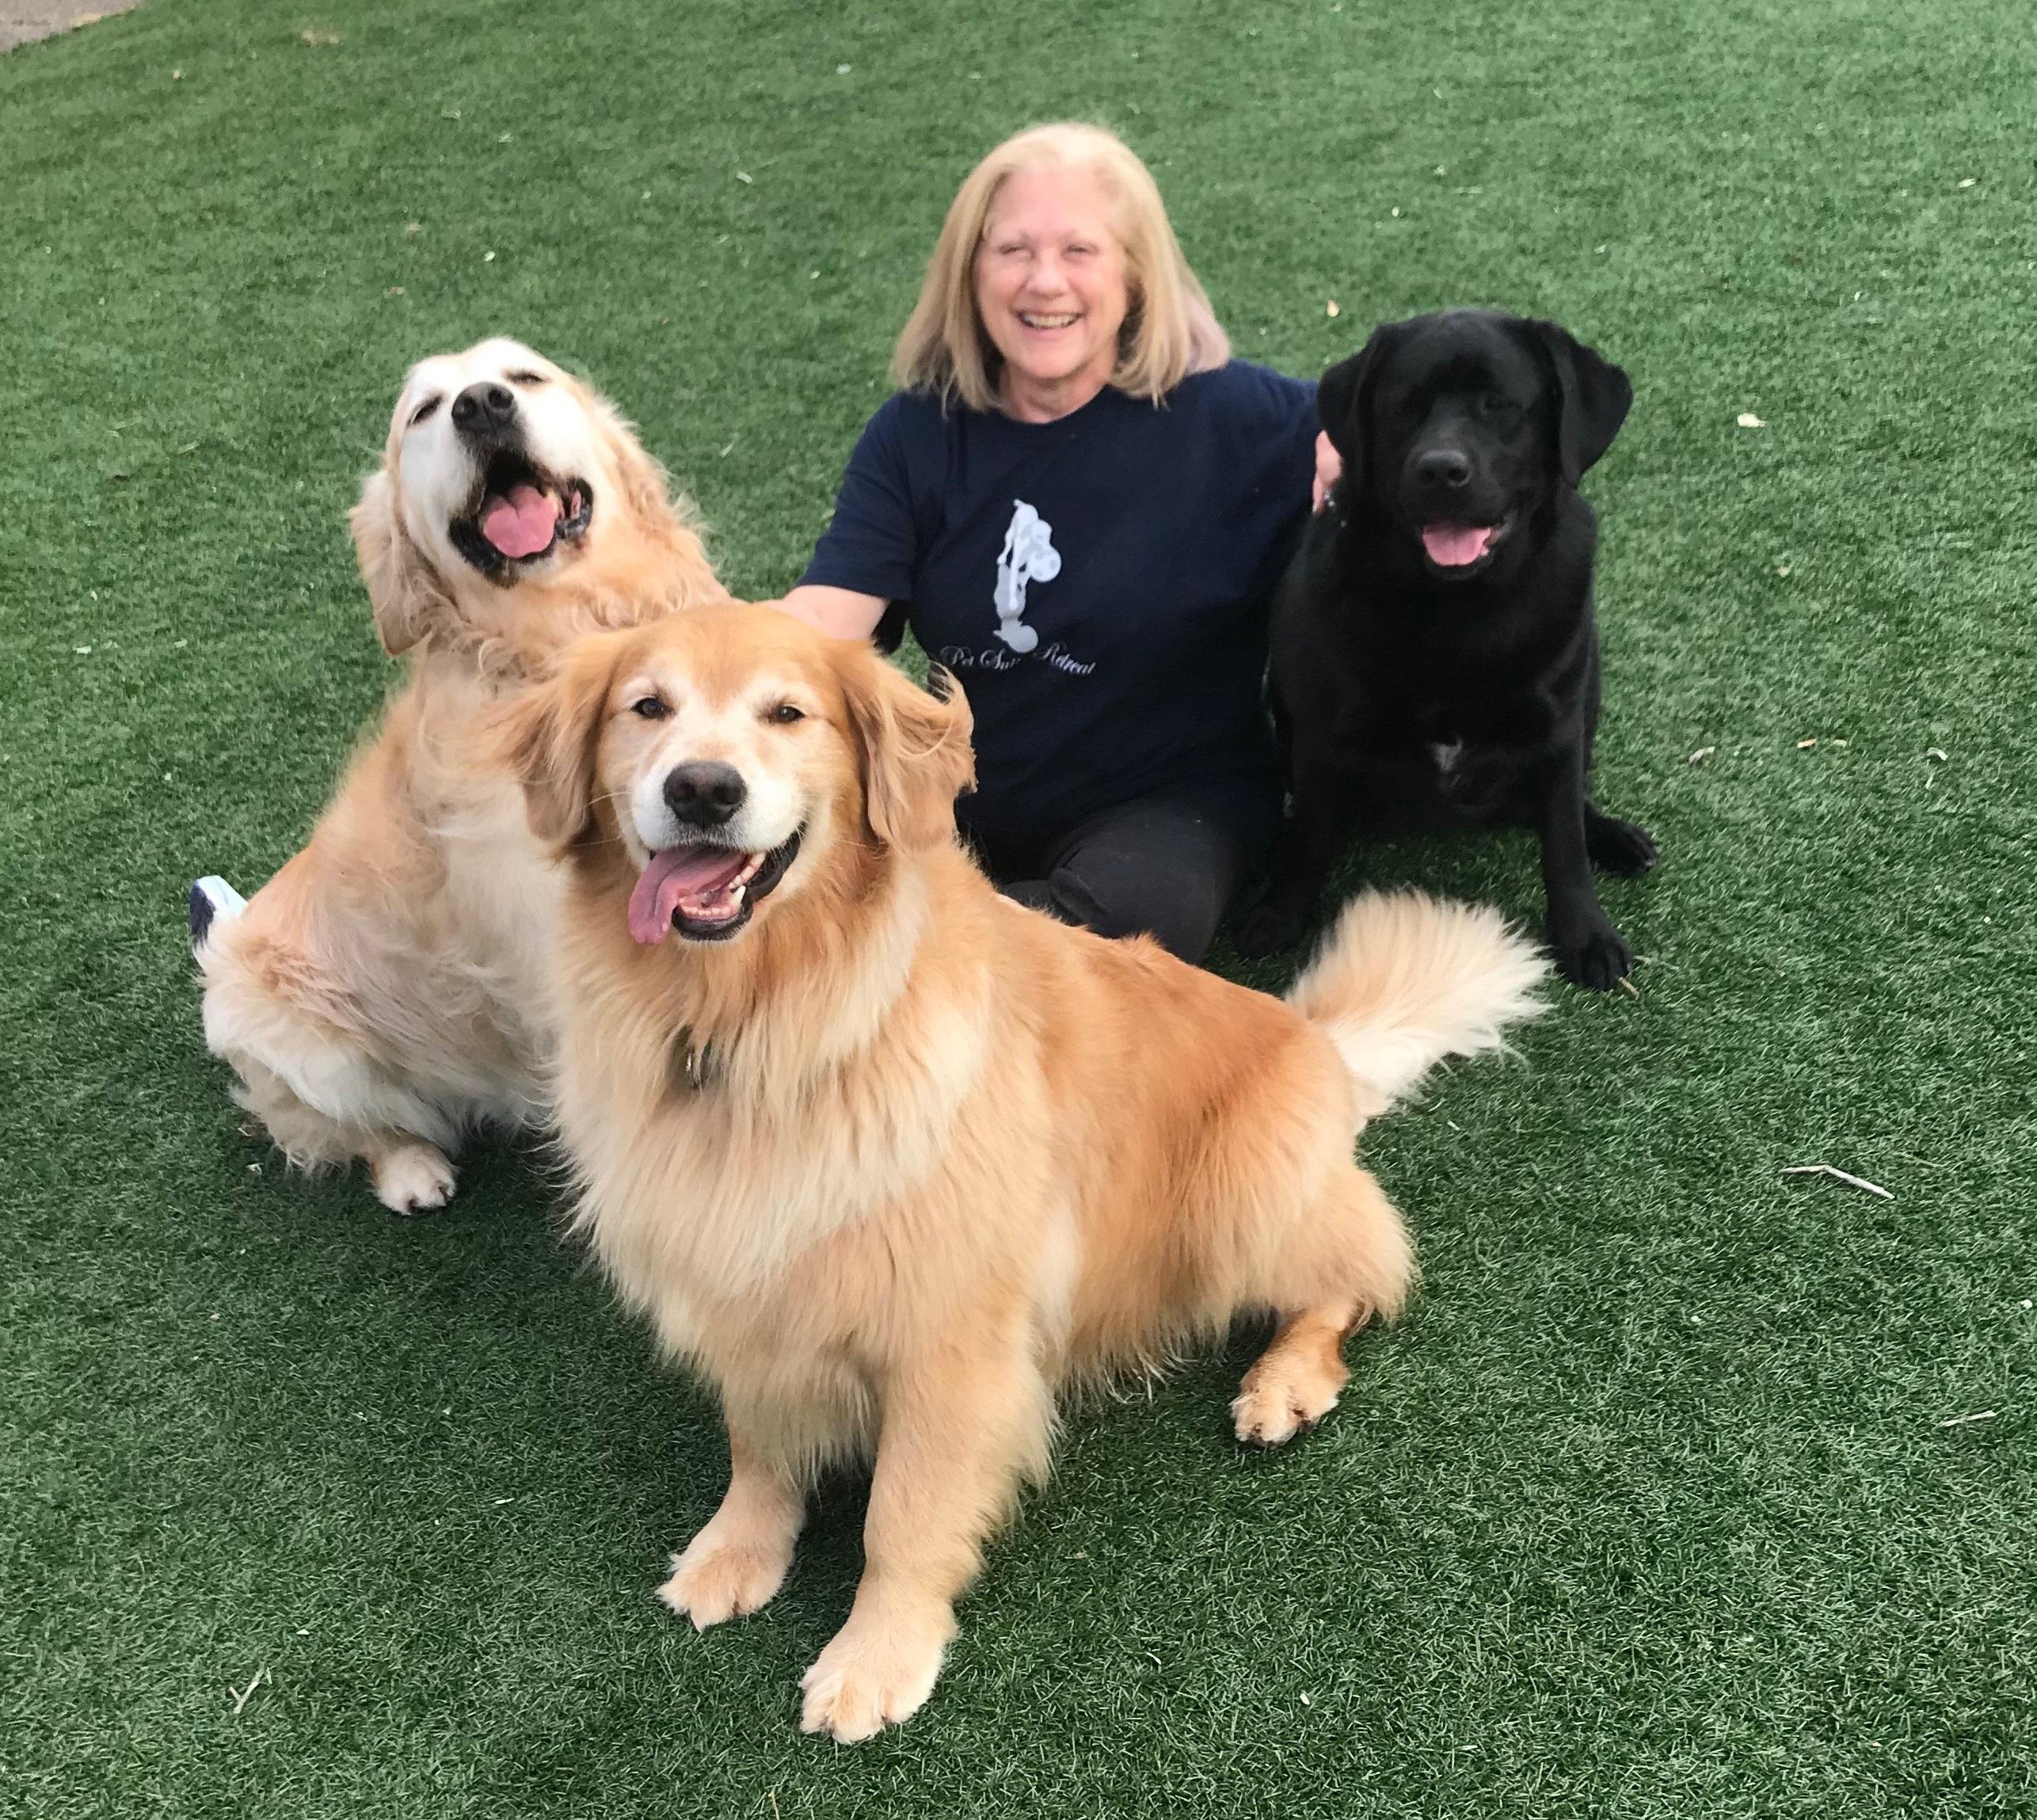 Pet enthusiast and native Detroiter Karen Knopper pledges $1.875 million to the School of Medicine